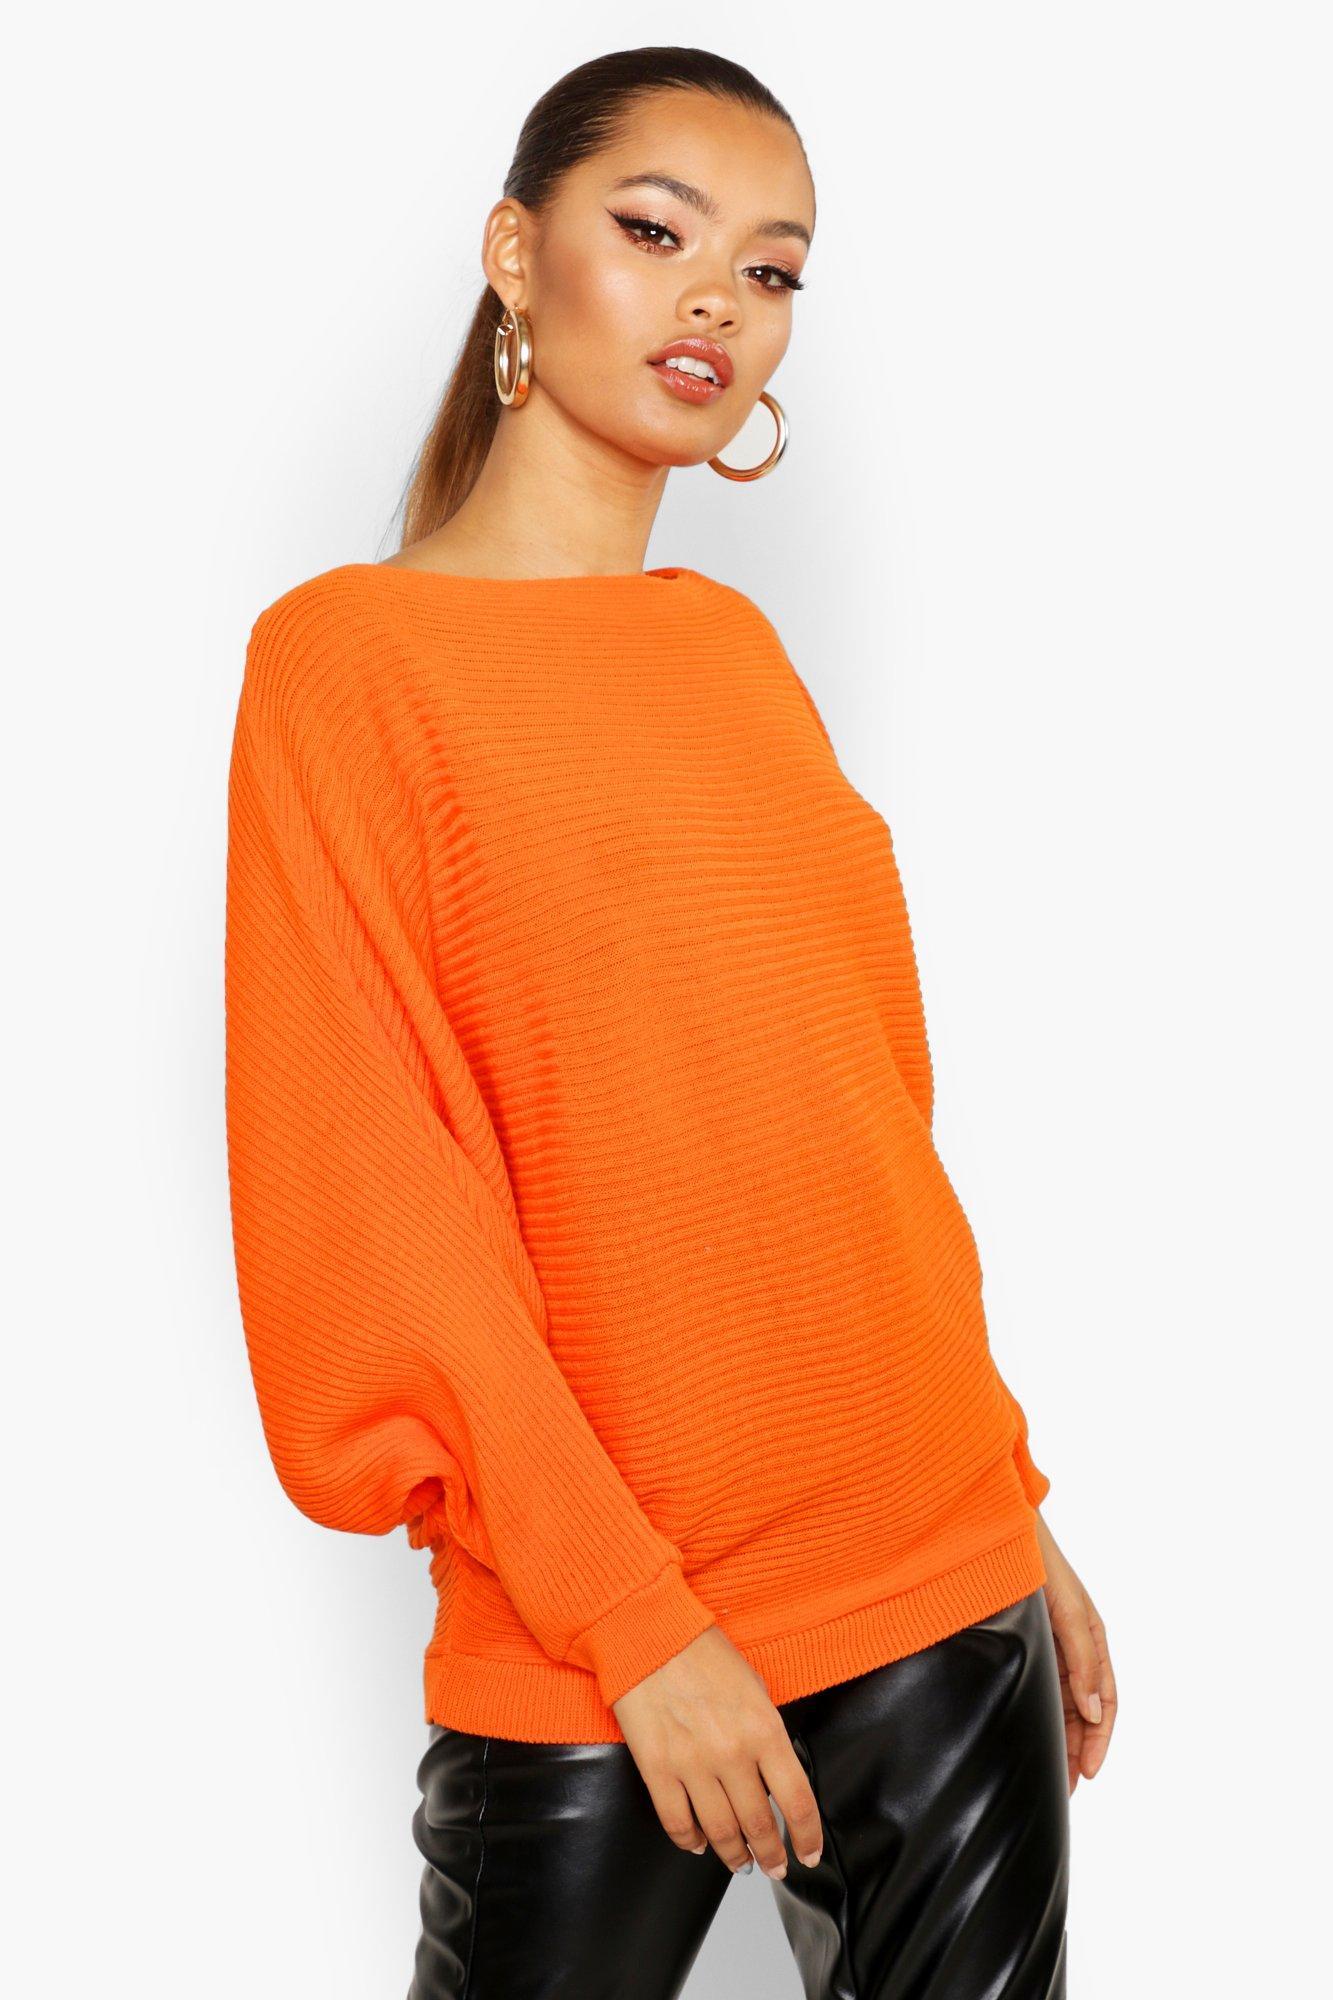 boohoo Womens Oversized Rib Knit Batwing Jumper - Orange - S/M, Orange